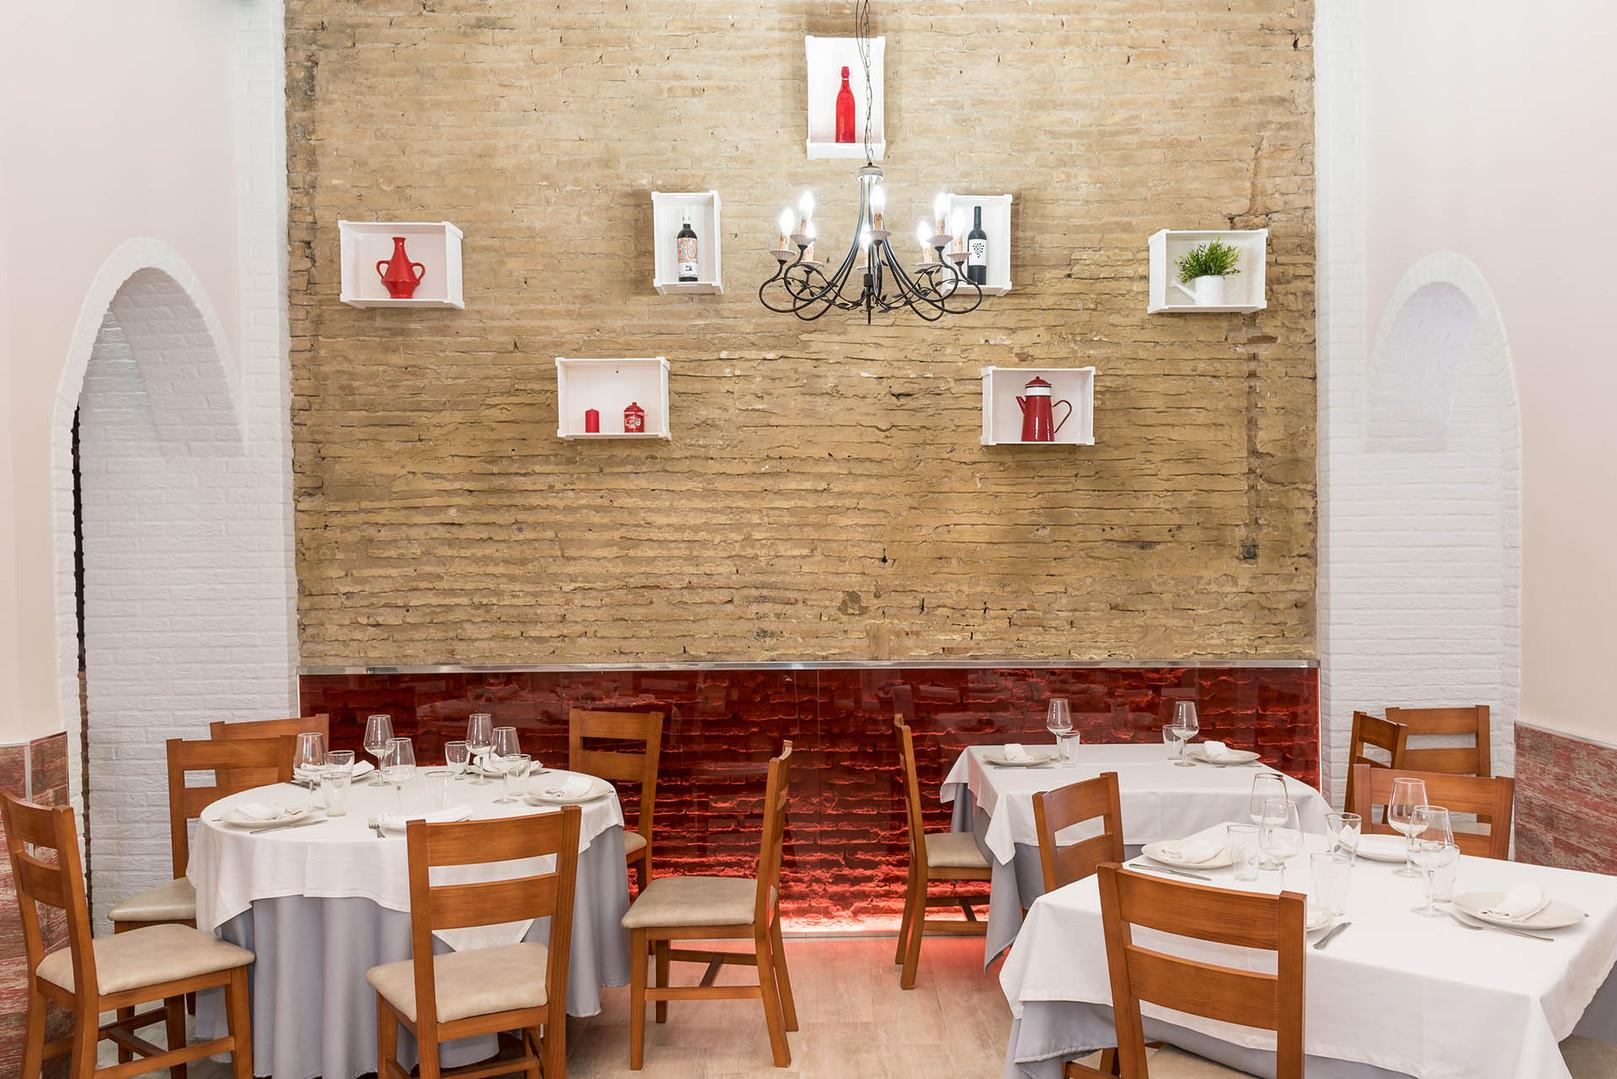 Restaurant L'alter